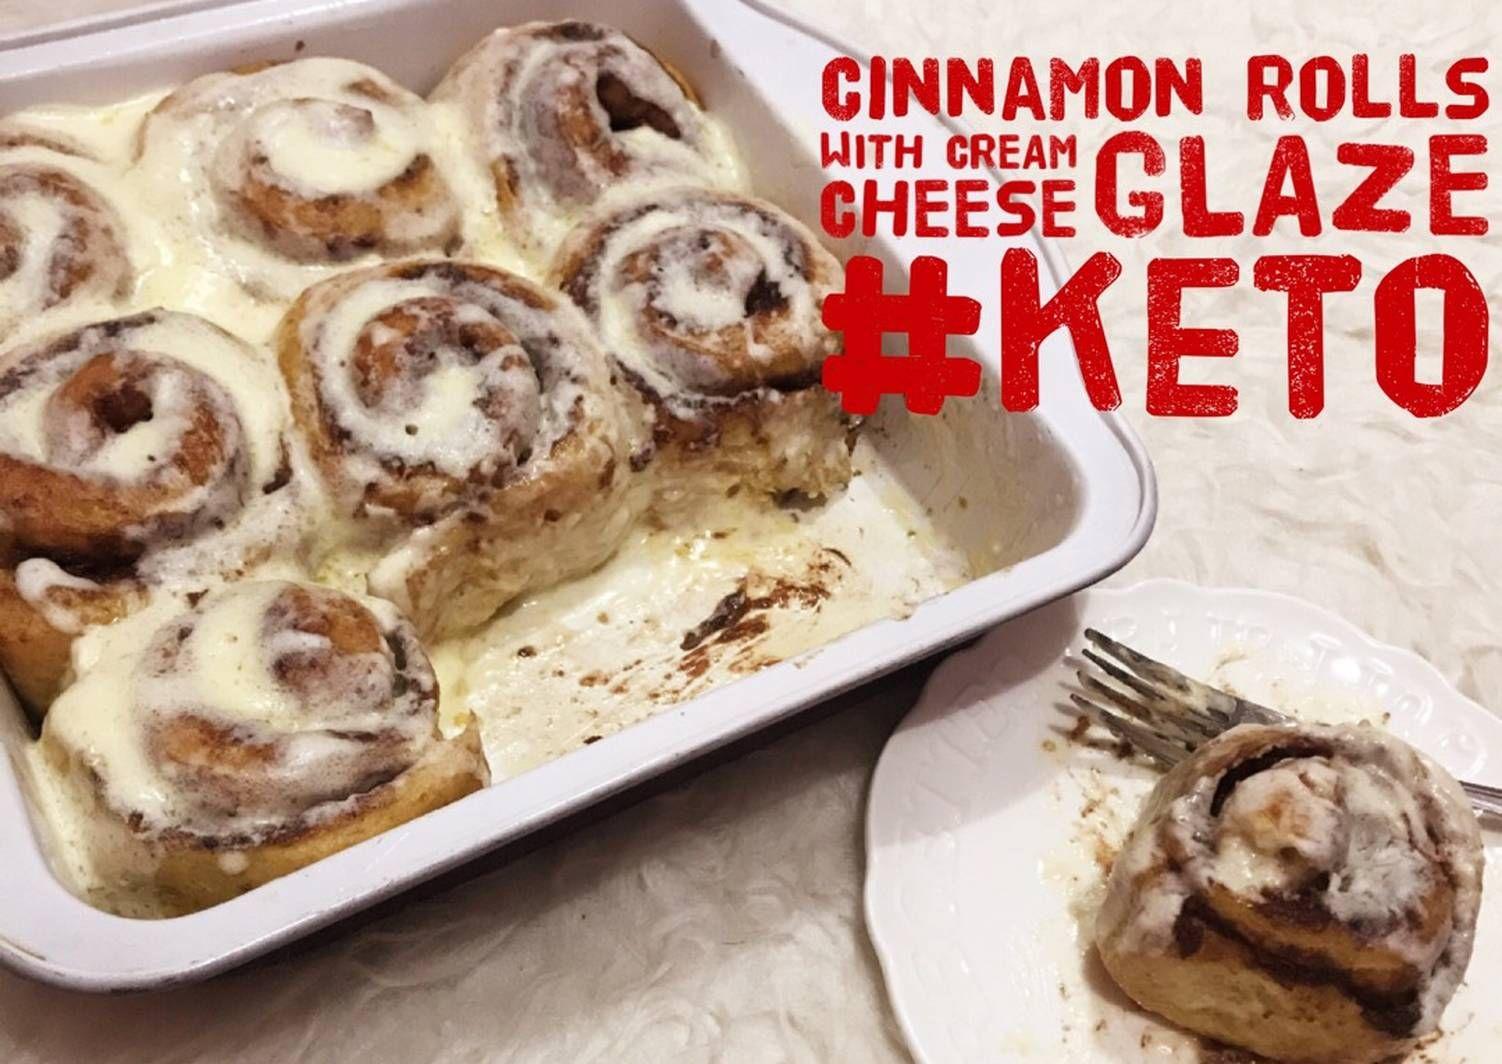 Resep Keto Cinnamon Rolls With Cream Cheese Glaze Allaire Bread Flour Oleh Rina Ardis Rhaxma Resep Roti Cinnamon Roll Keju Krim Resep Keto